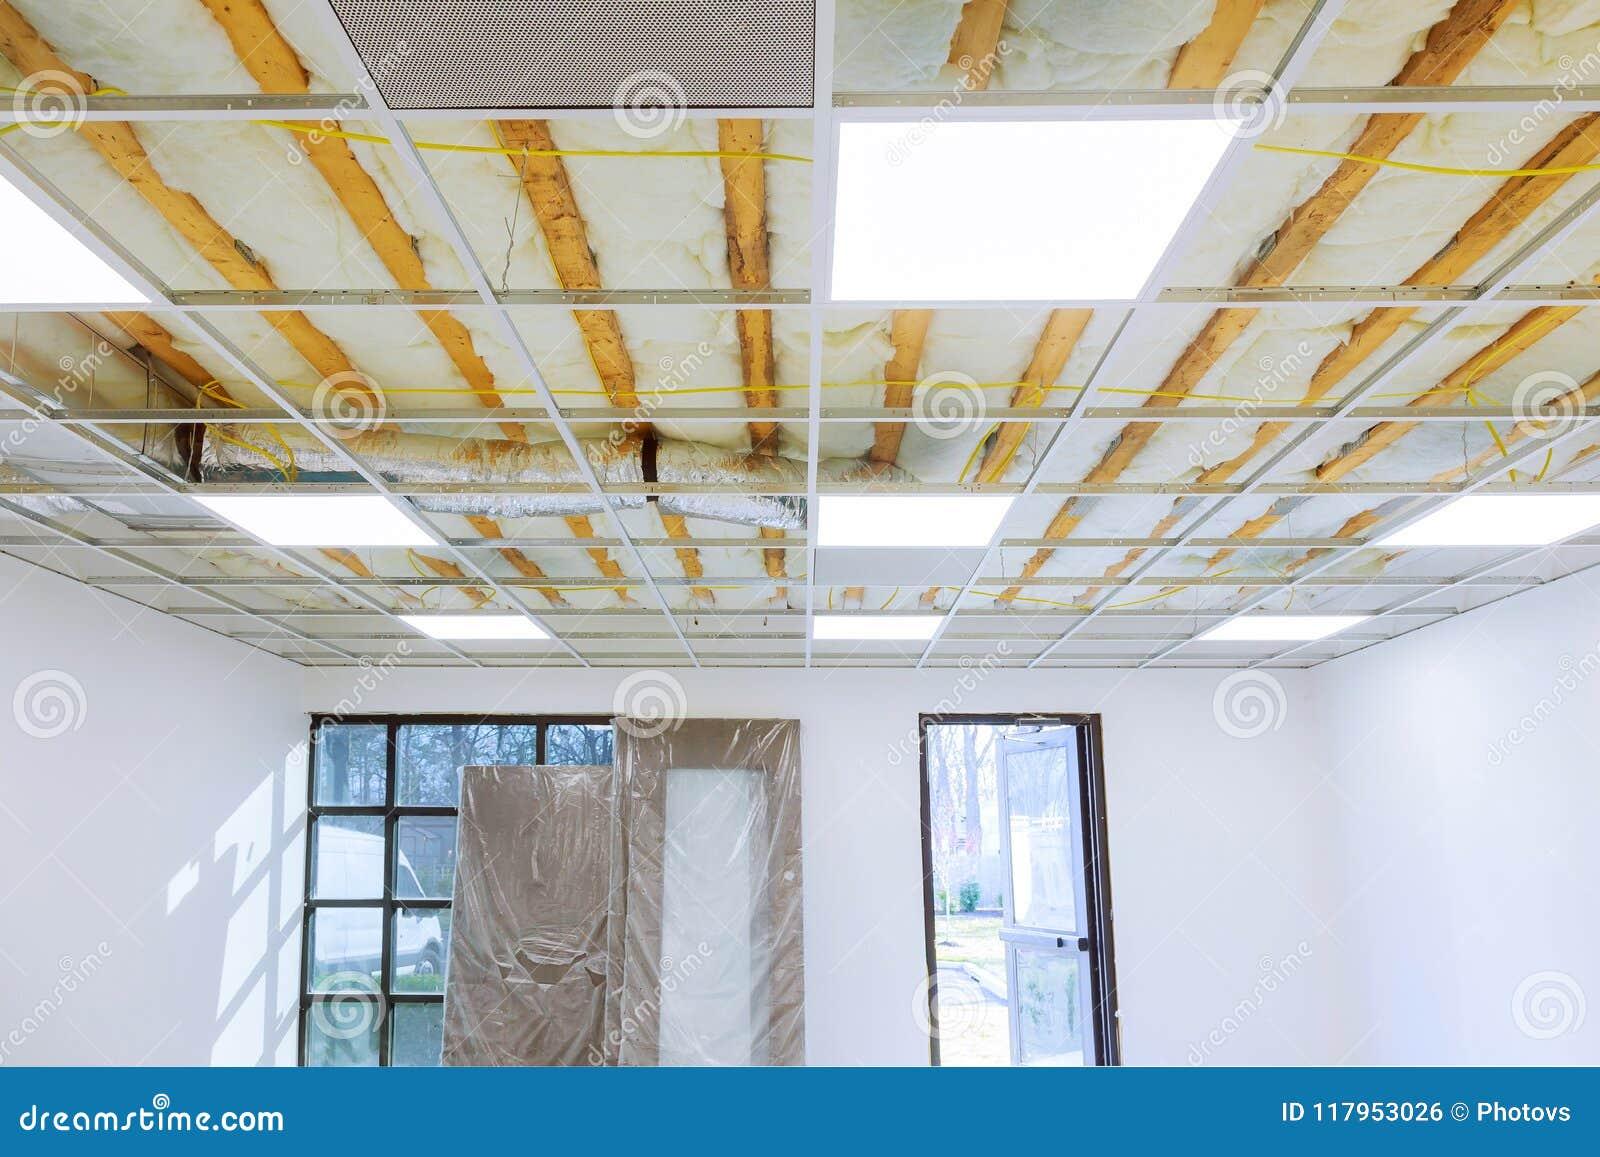 Structure De Plafond Suspendu Avant Installation De La Plaque De